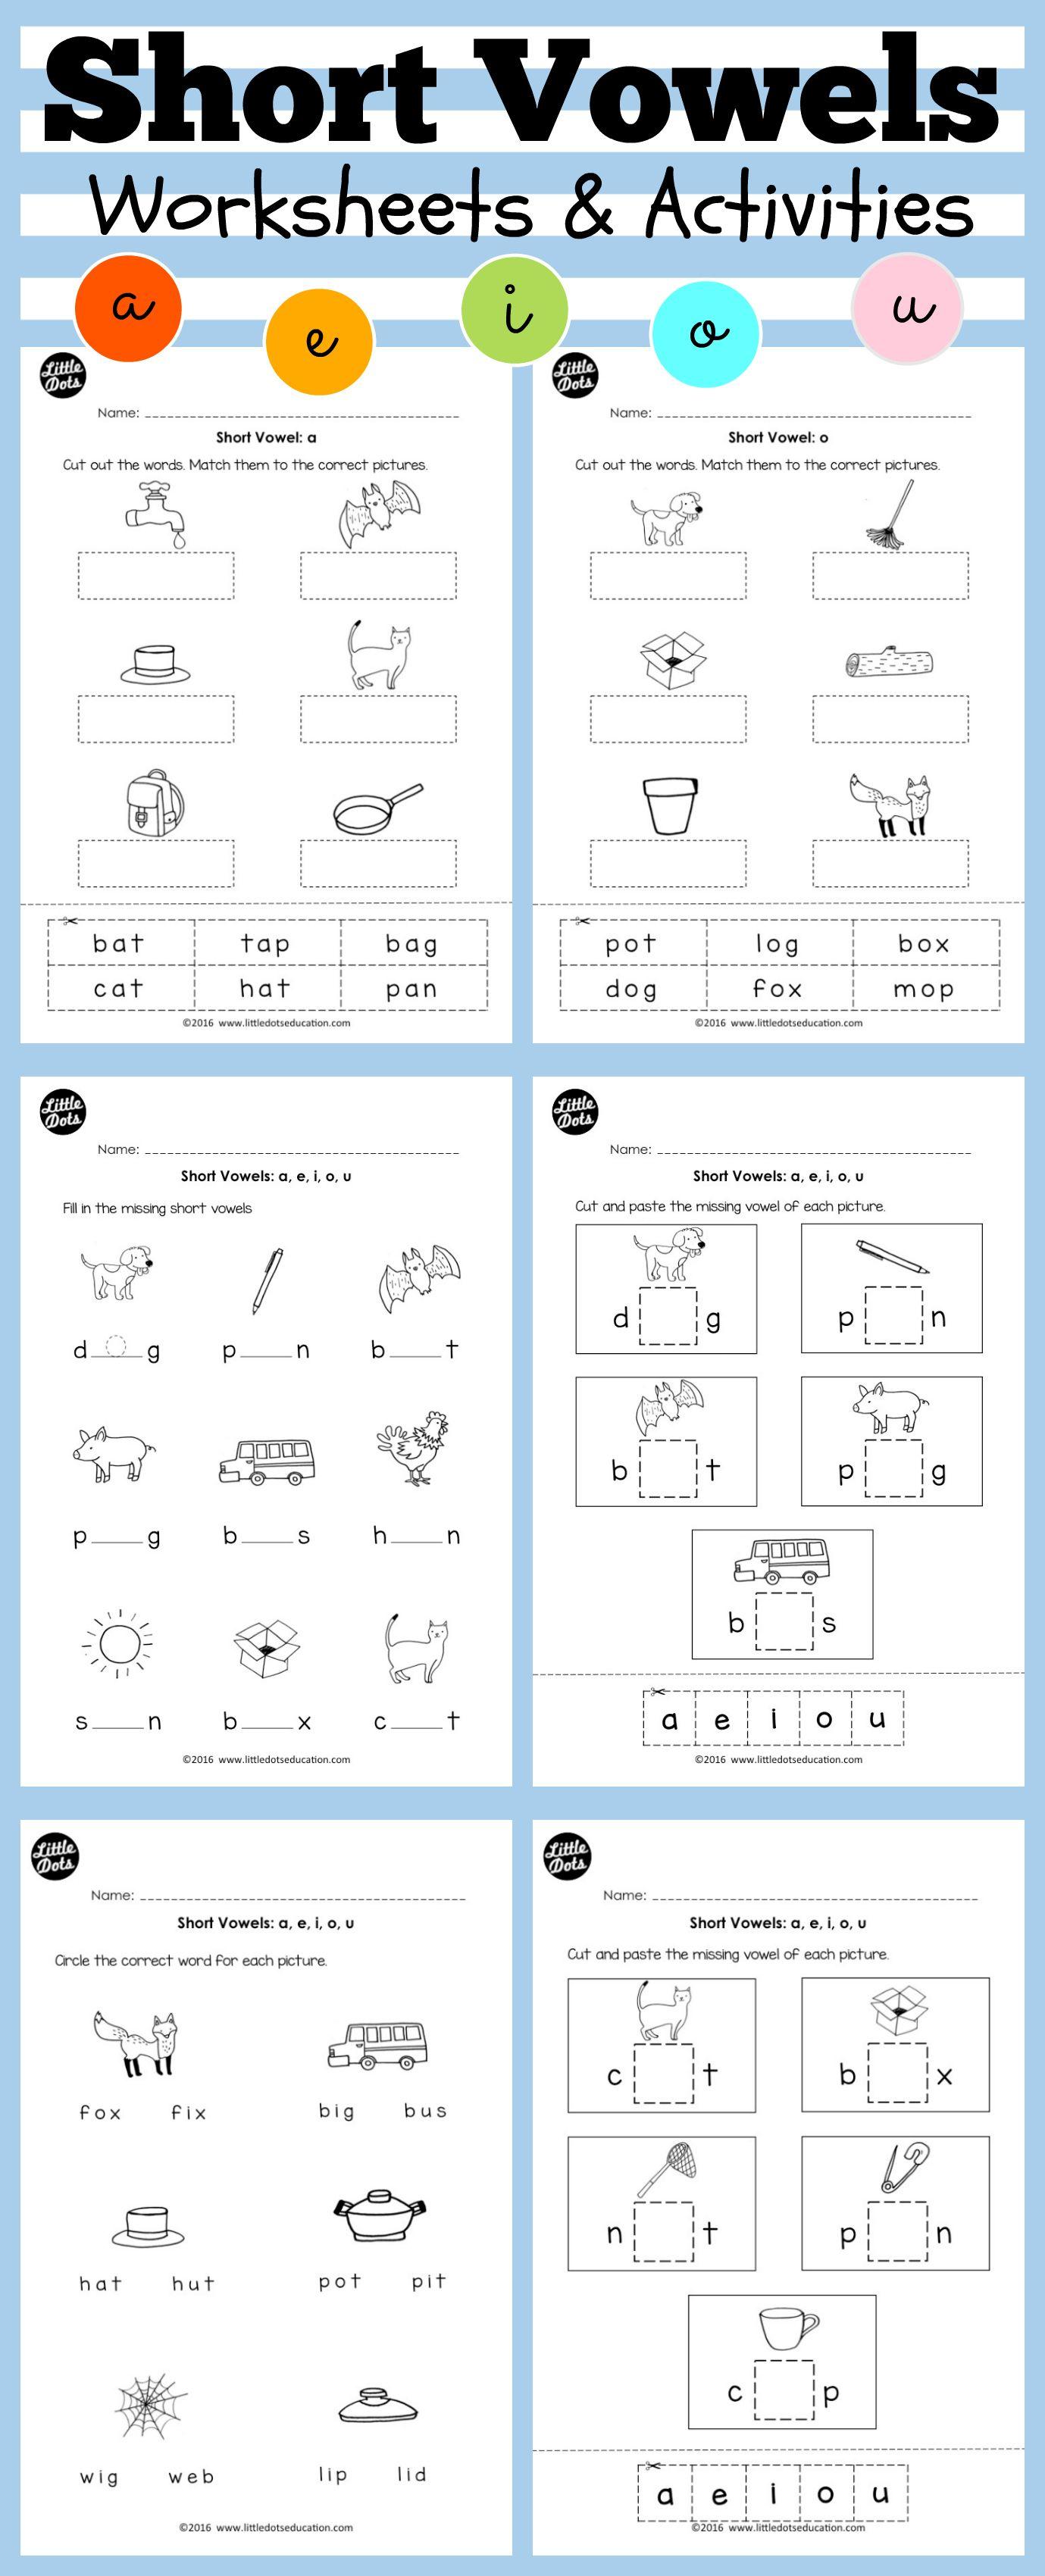 Worksheets Missing Vowel Worksheets short vowels worksheets and activities for preschool or kindergarten class practice to hear the short